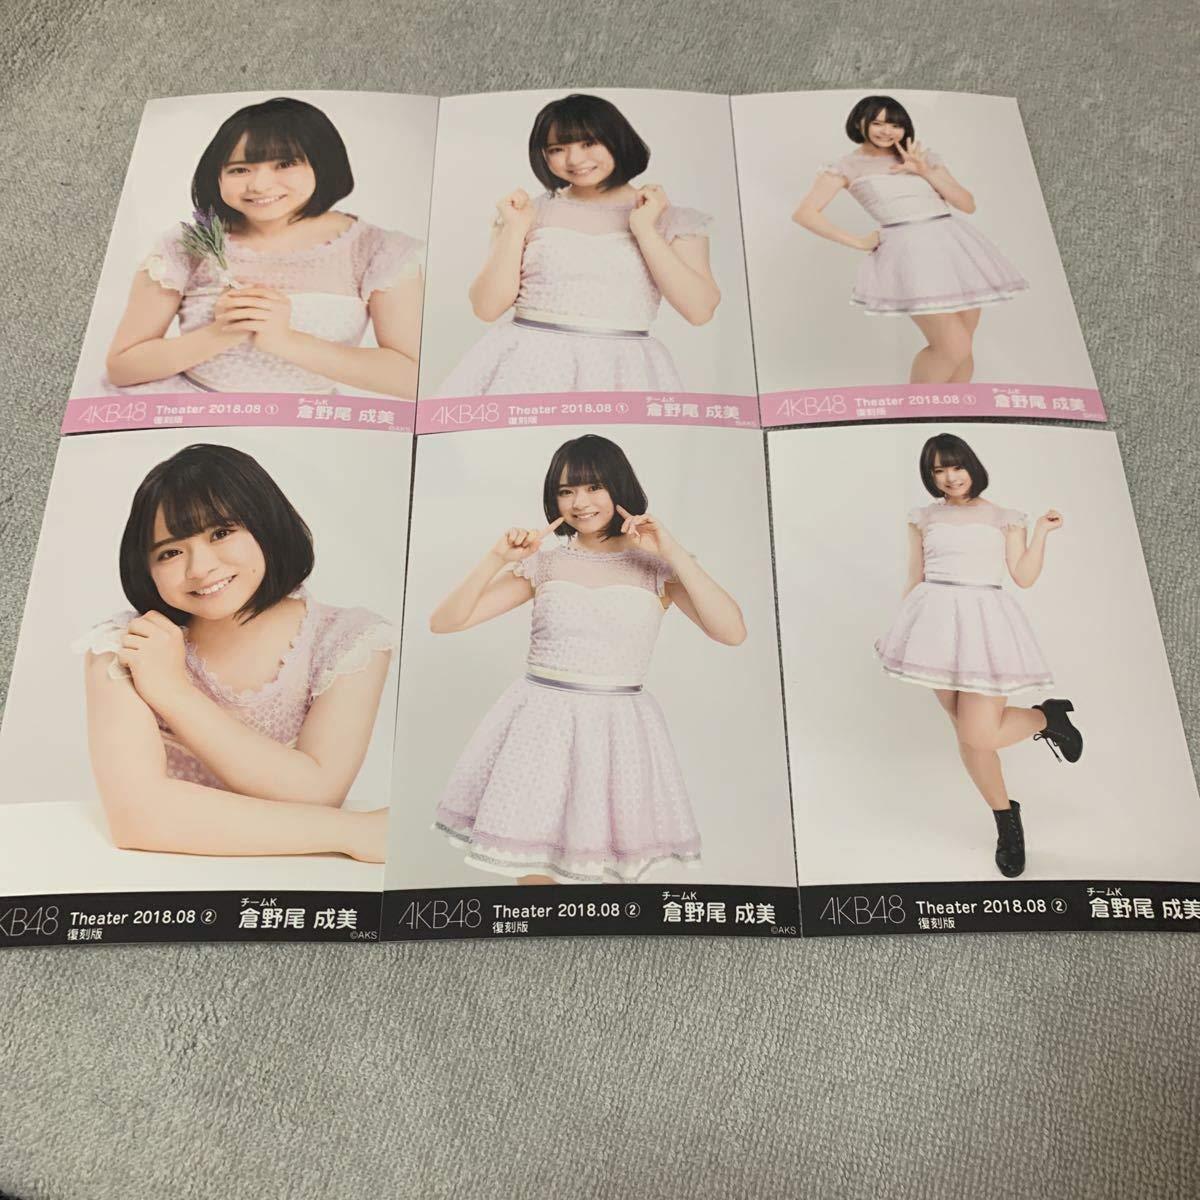 AKB48 2018年 8月 August 福袋当選品 月別 復刻版 生写真 6種コンプ ①② 倉野尾成美   B07QGRV8SZ